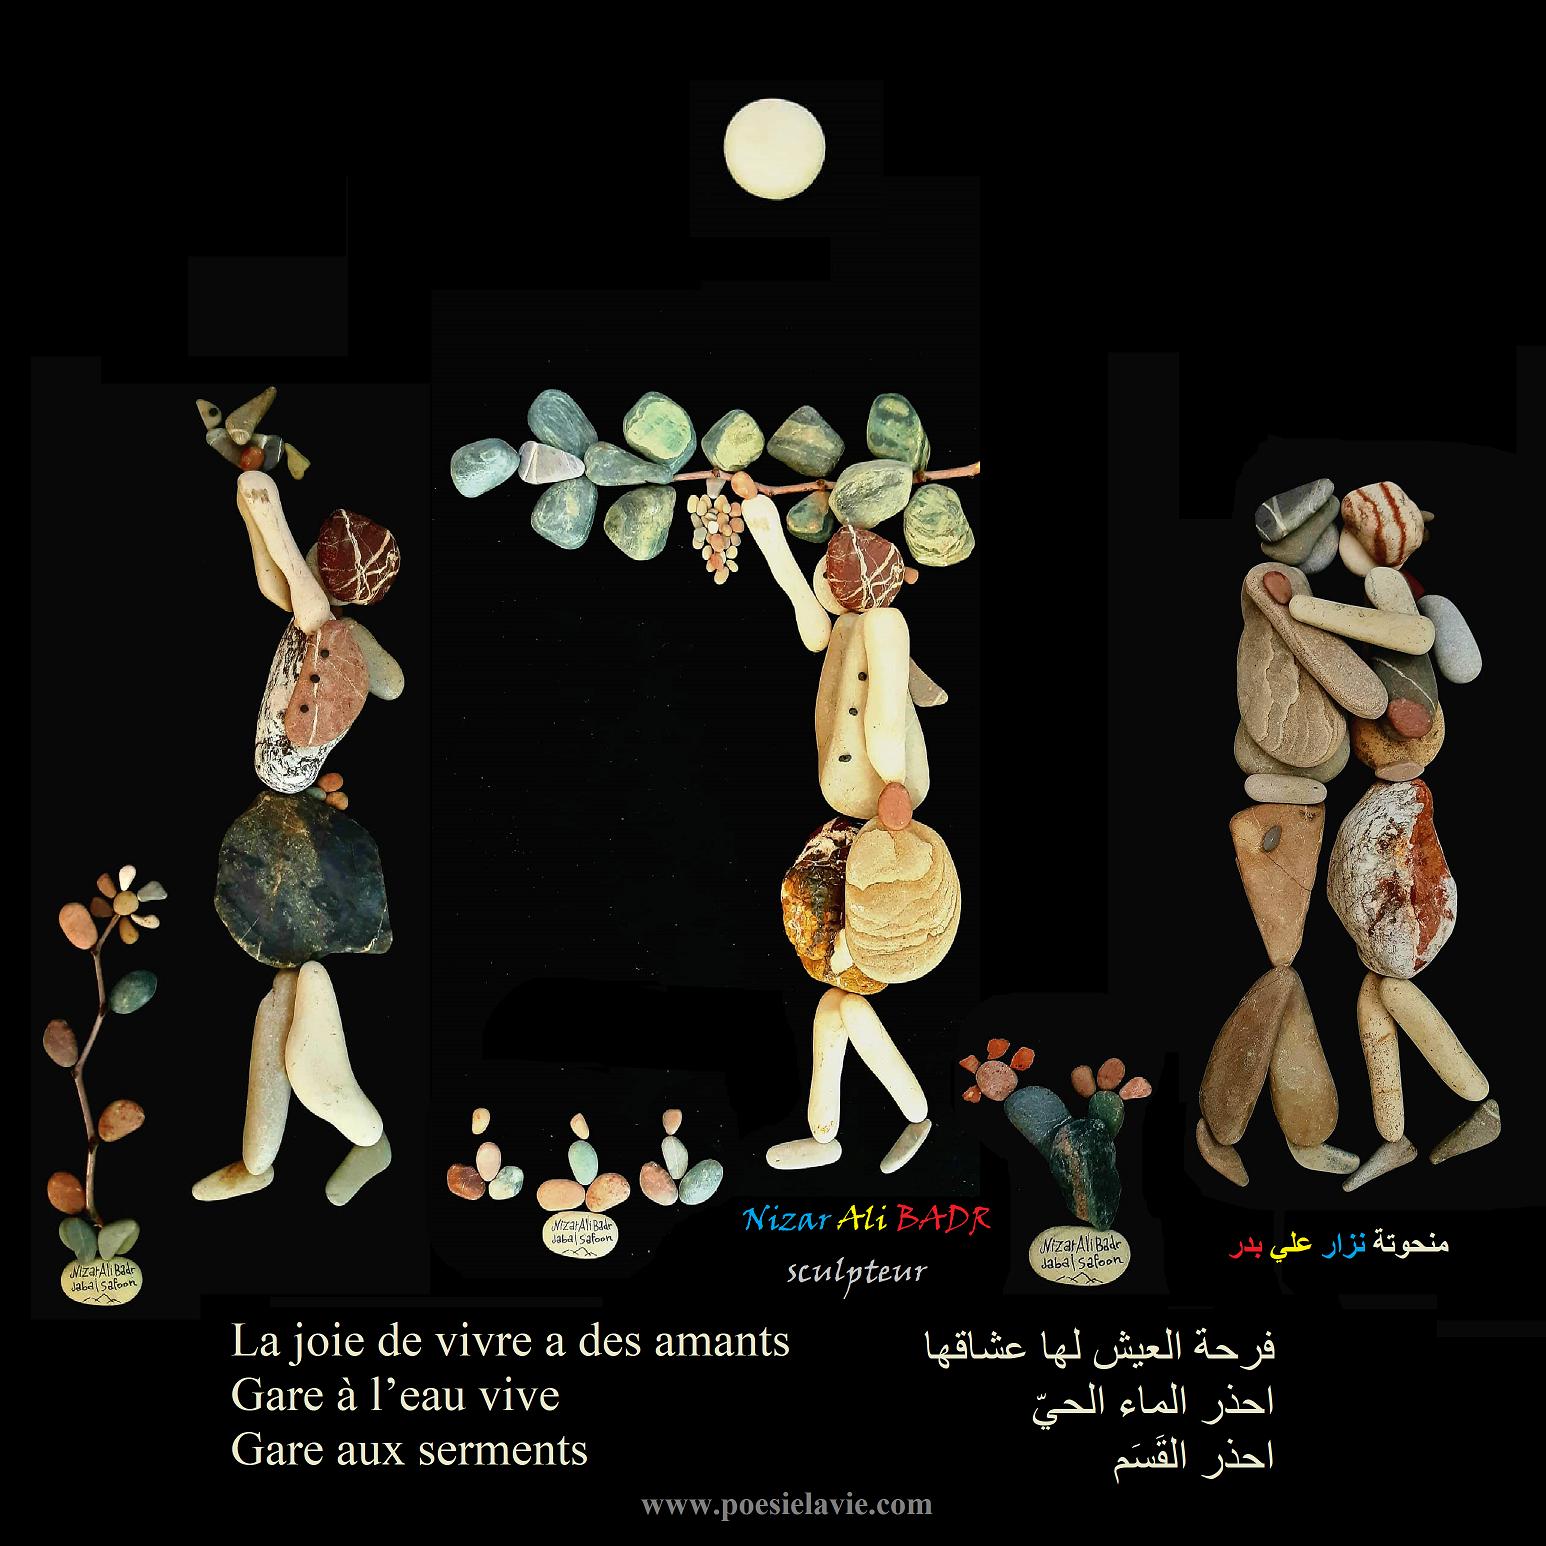 - Nizar Ali Badr, sculpteur du monde - بدر شاعر العالم